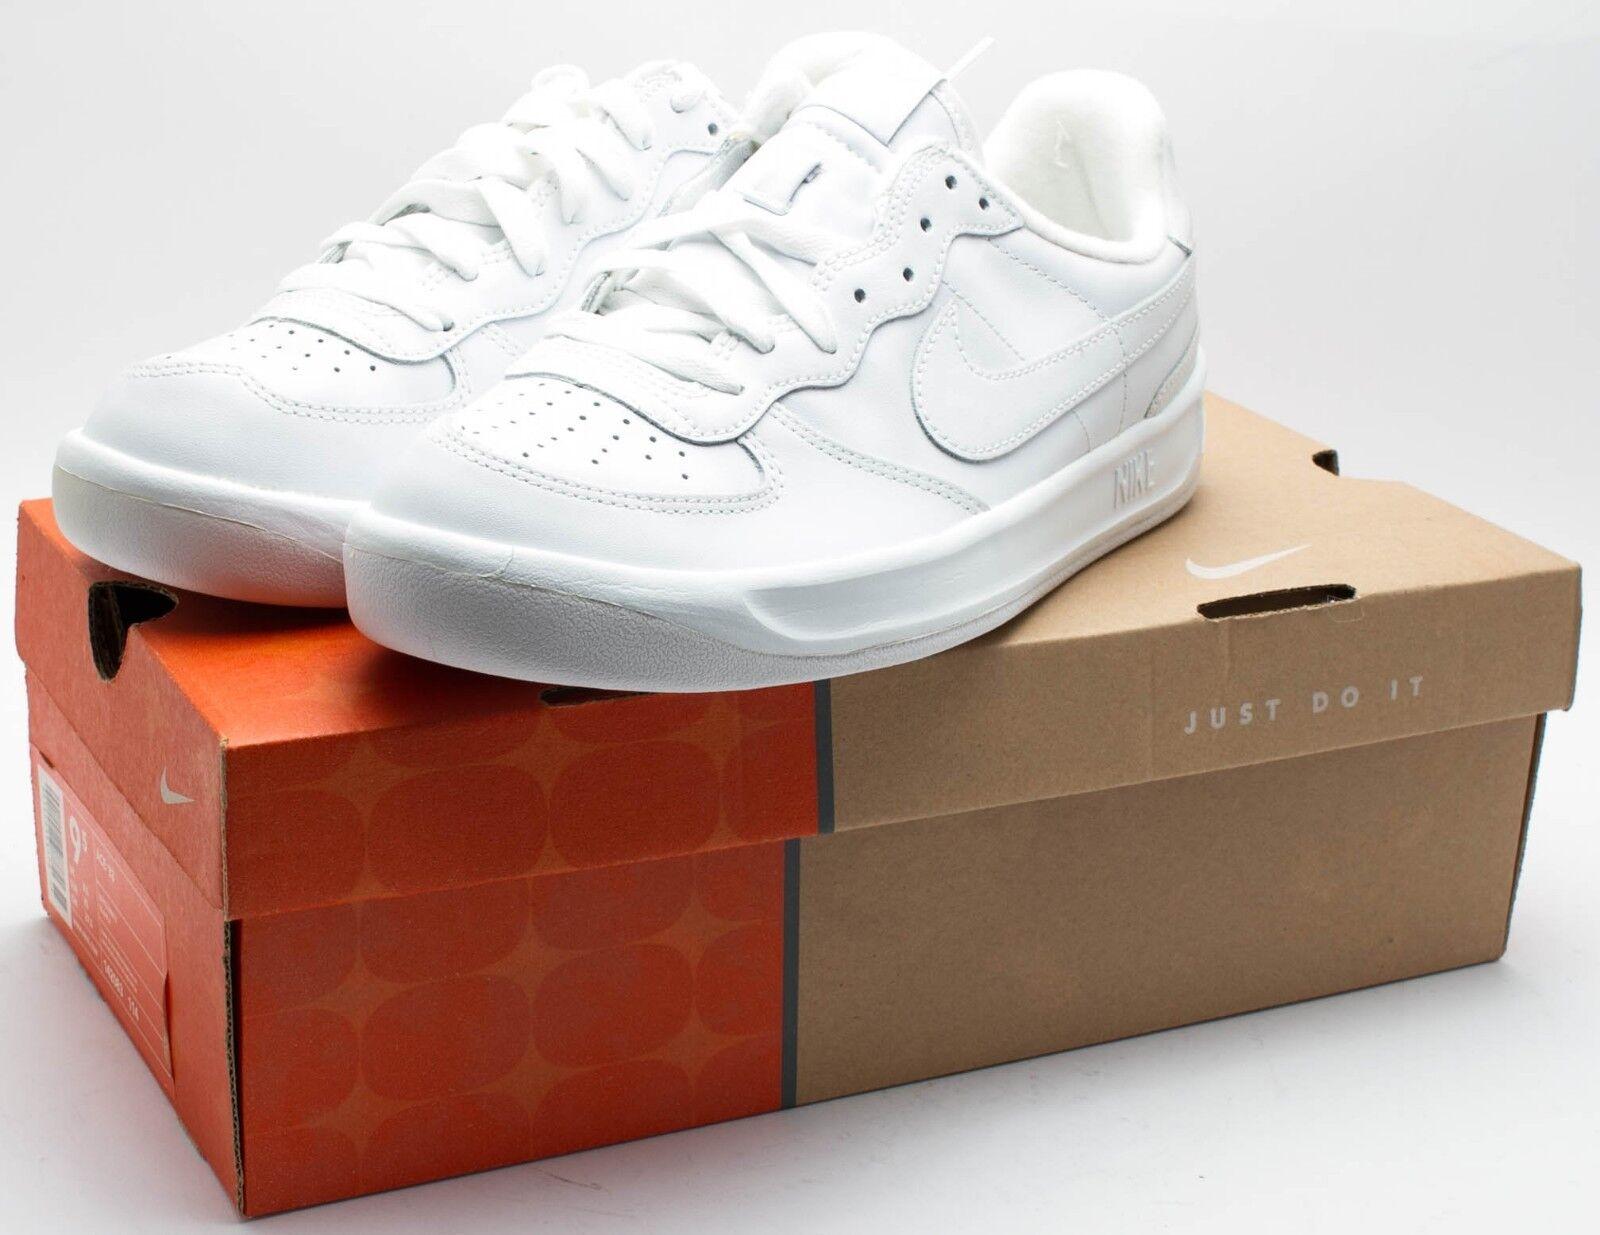 Nike Herren Vintage 2000 ACE '83 Schuhe 142083-114 weiß SZ 10